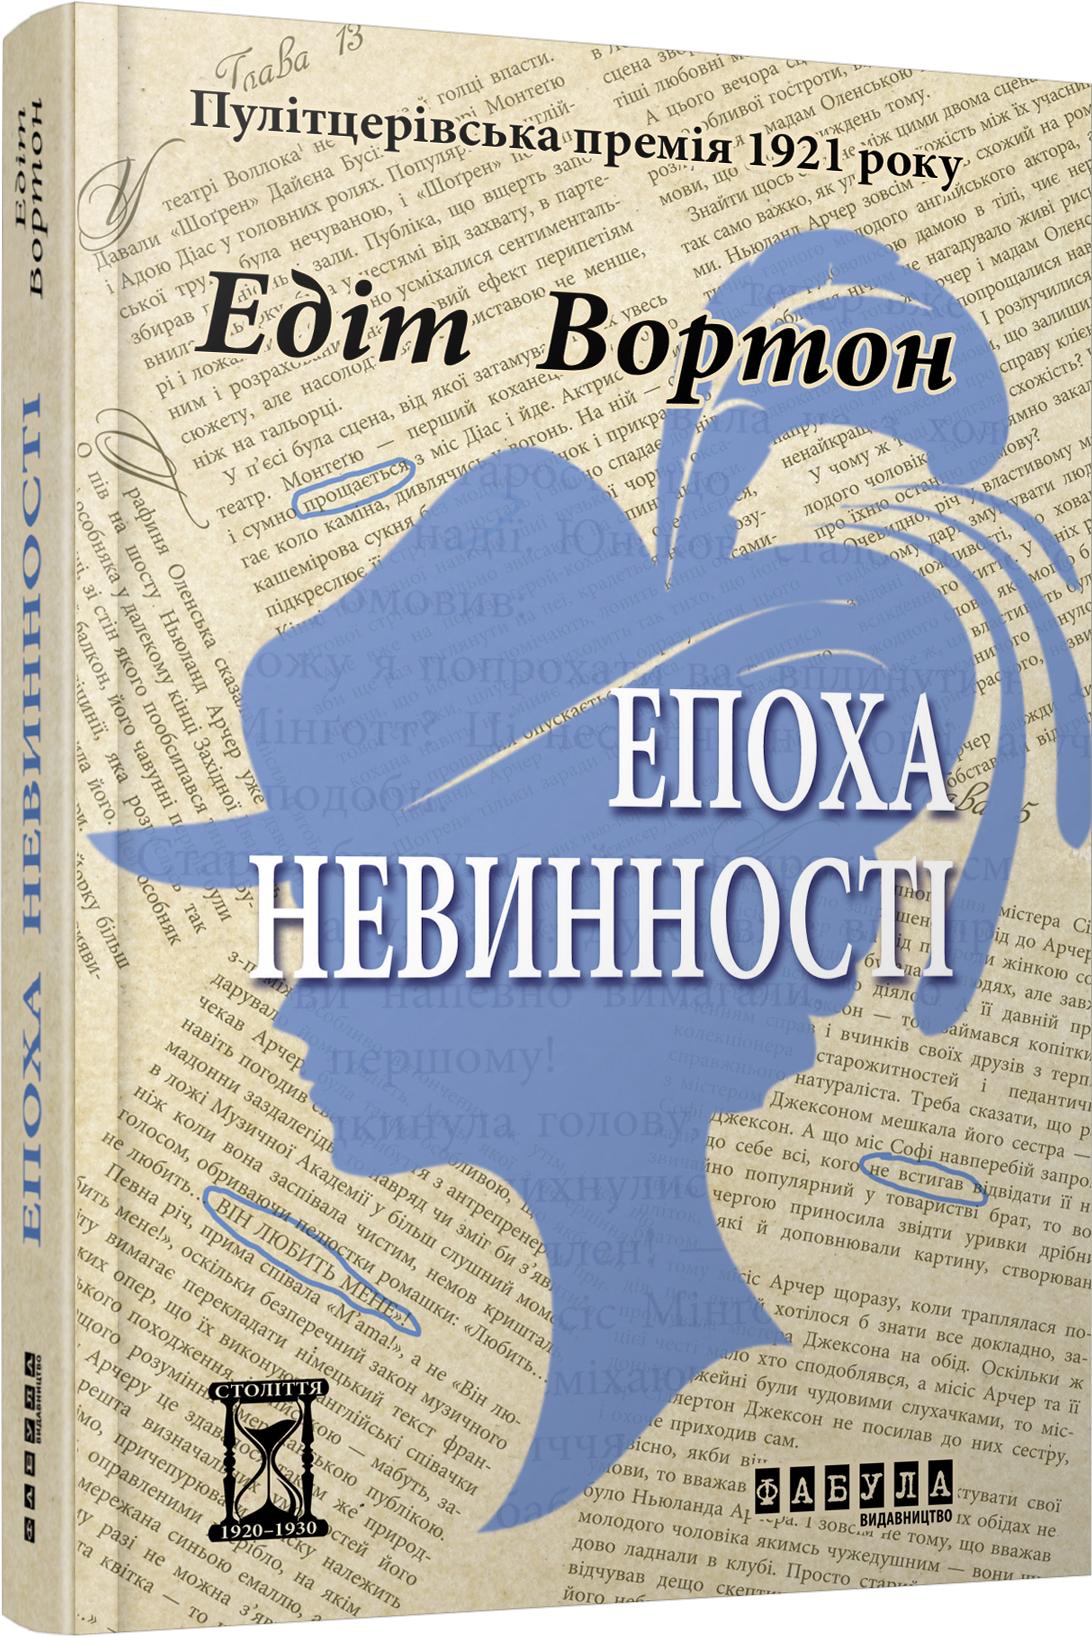 Must read: Эдит Вортон. «Эпоха невинности»